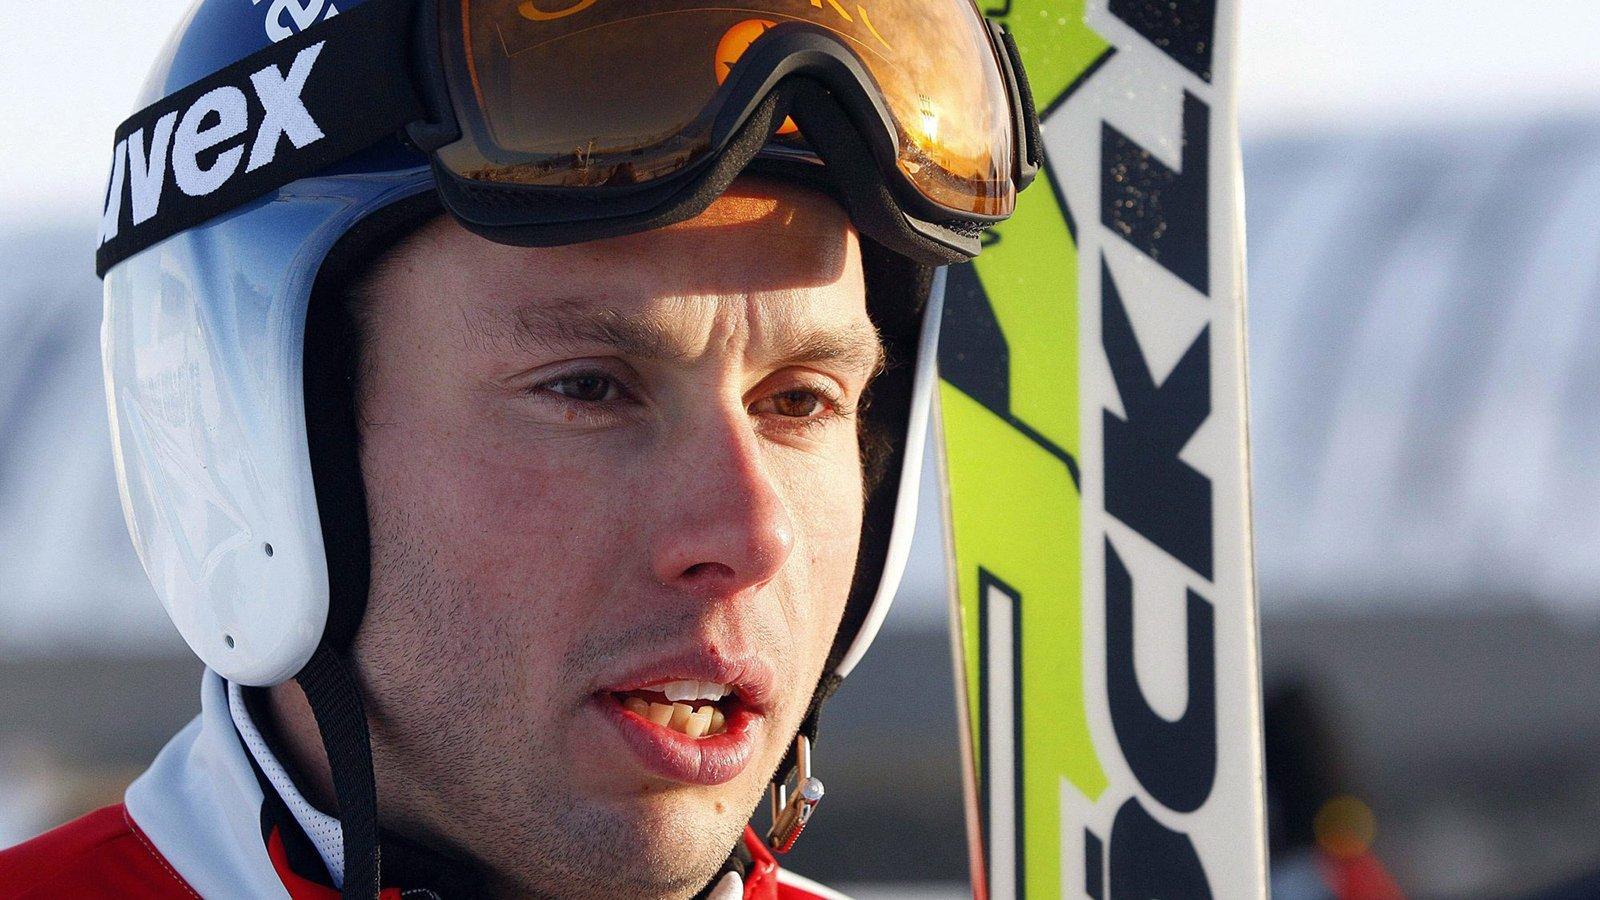 Canadian ski cross team member David Duncan spent Friday night in jail. (Credit: Jeff McIntosh/AP via CNN)